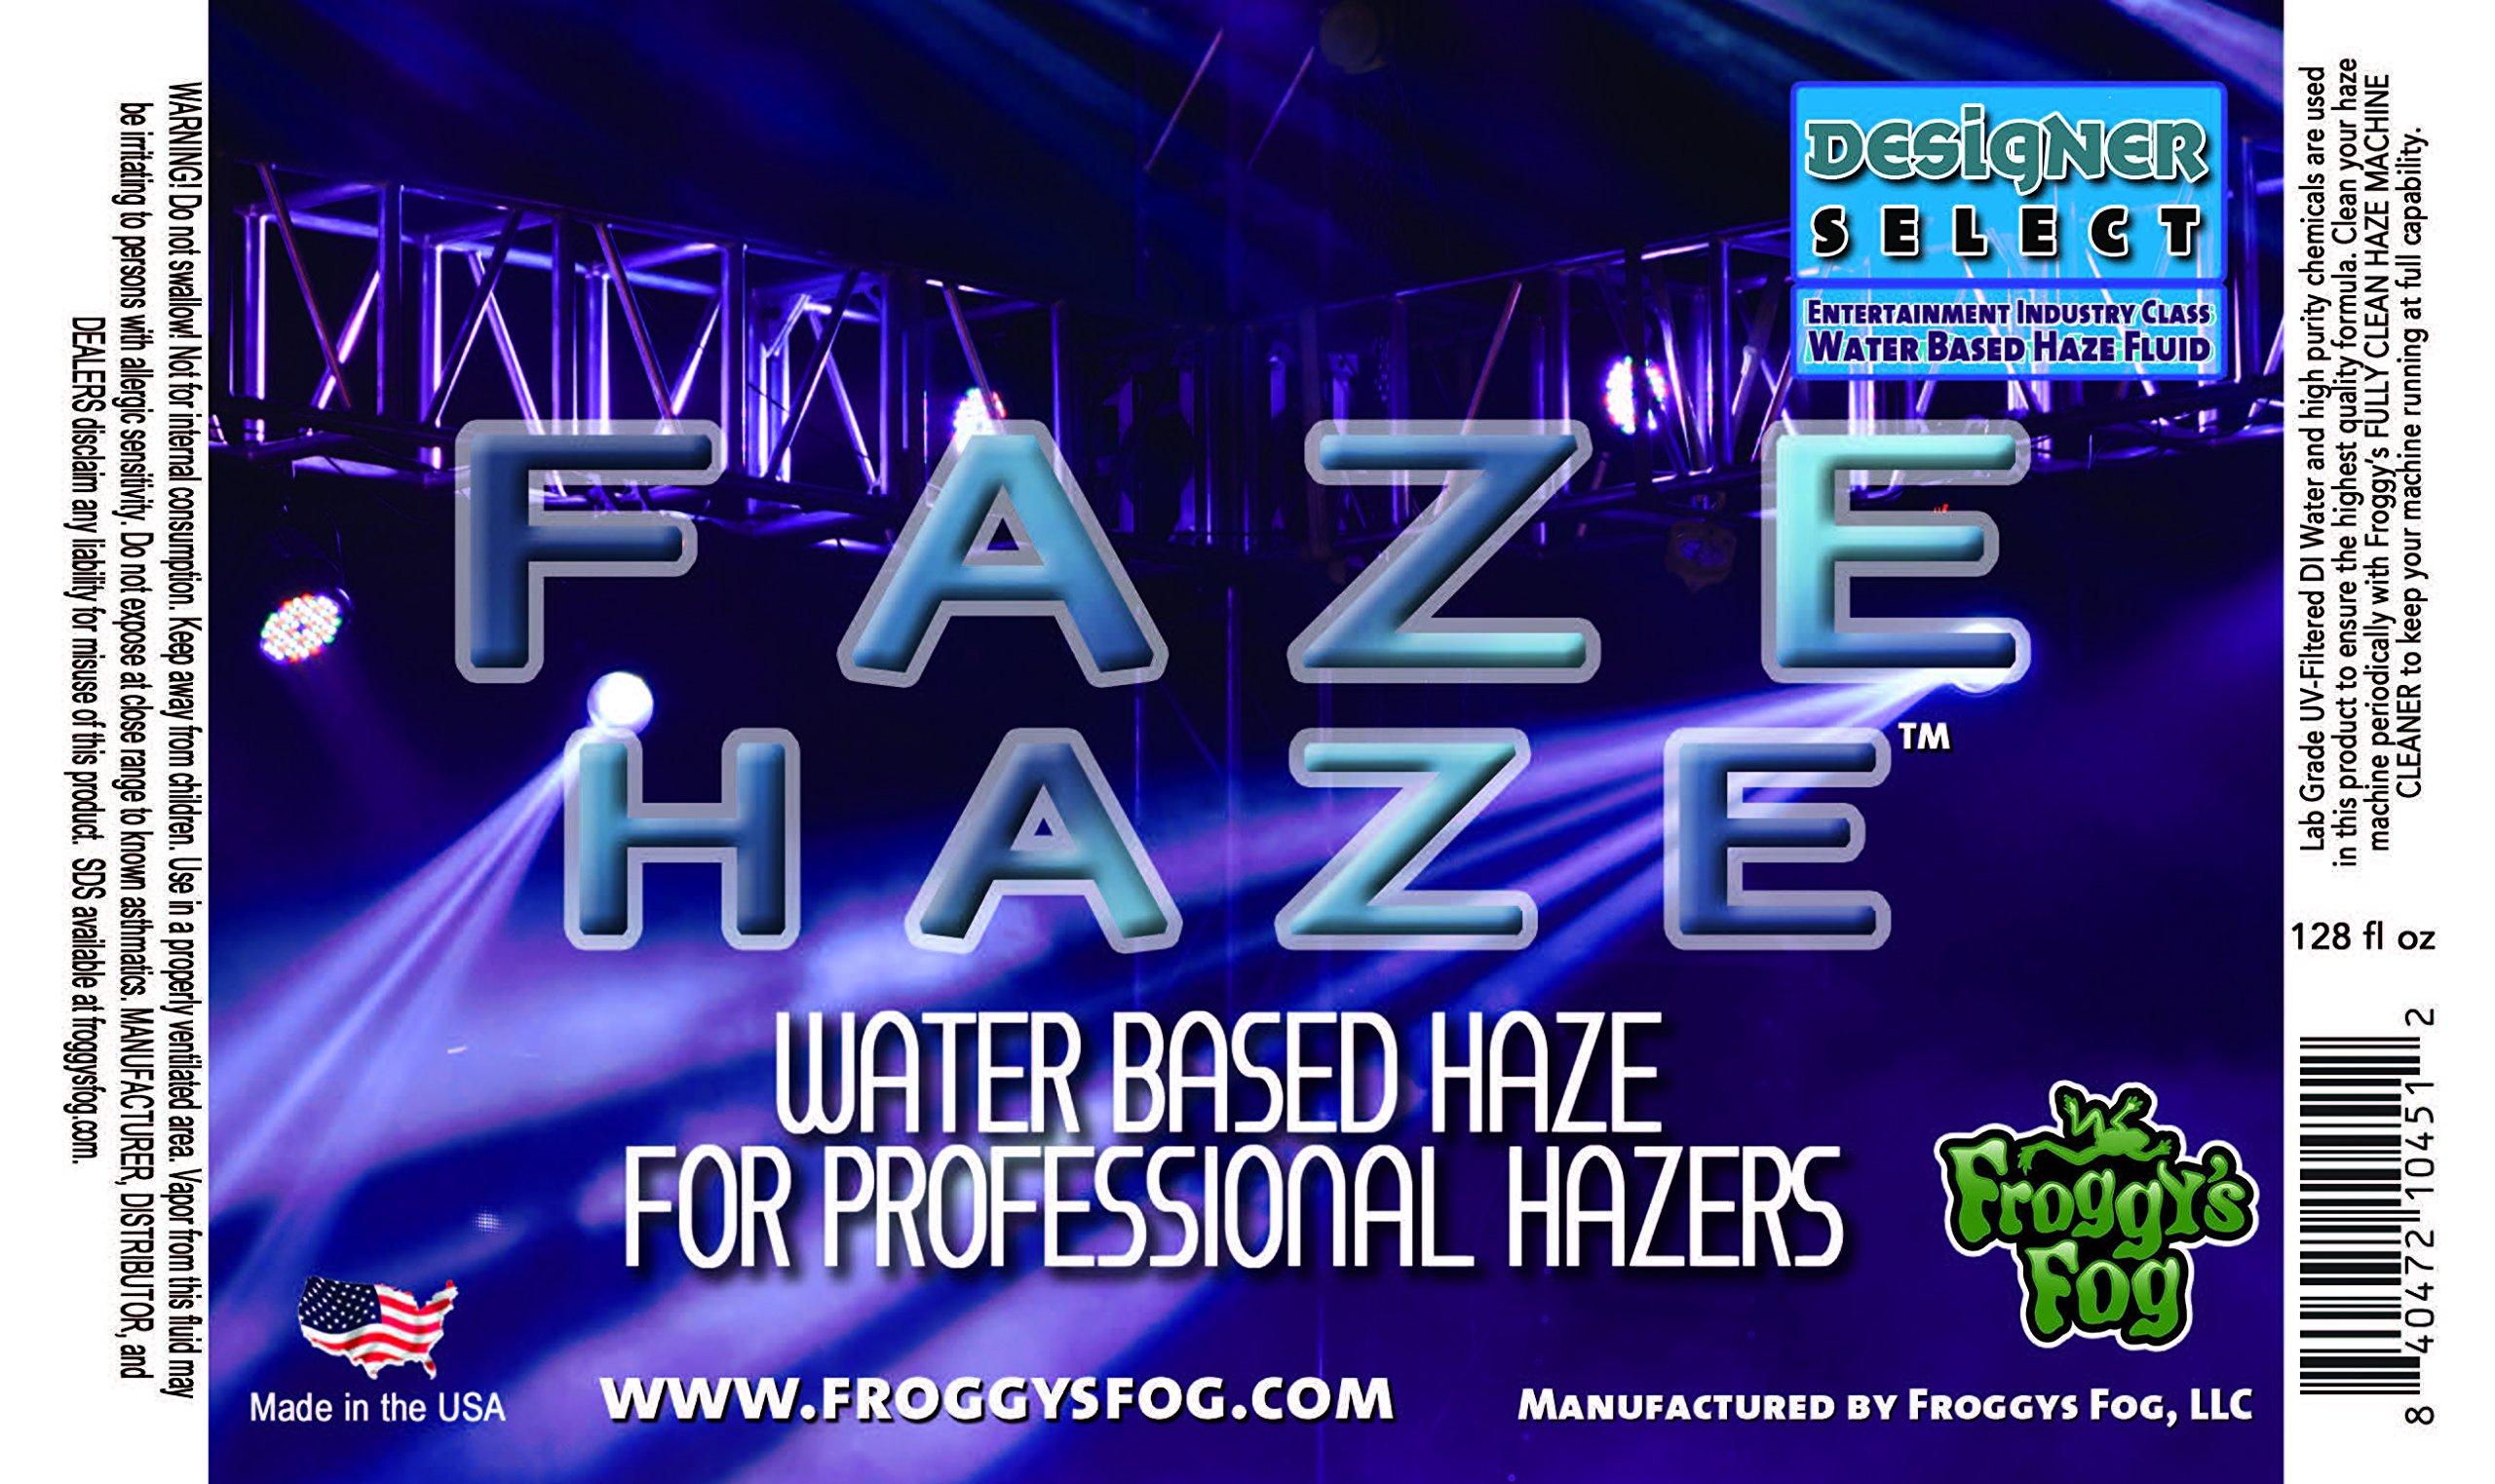 Faze Haze - Professional Water Based Haze Juice - for use in Antari Fazers, Chauvet Hazers, Base Hazer Pro and Martin Compact Hazers - 4 Gallon Case